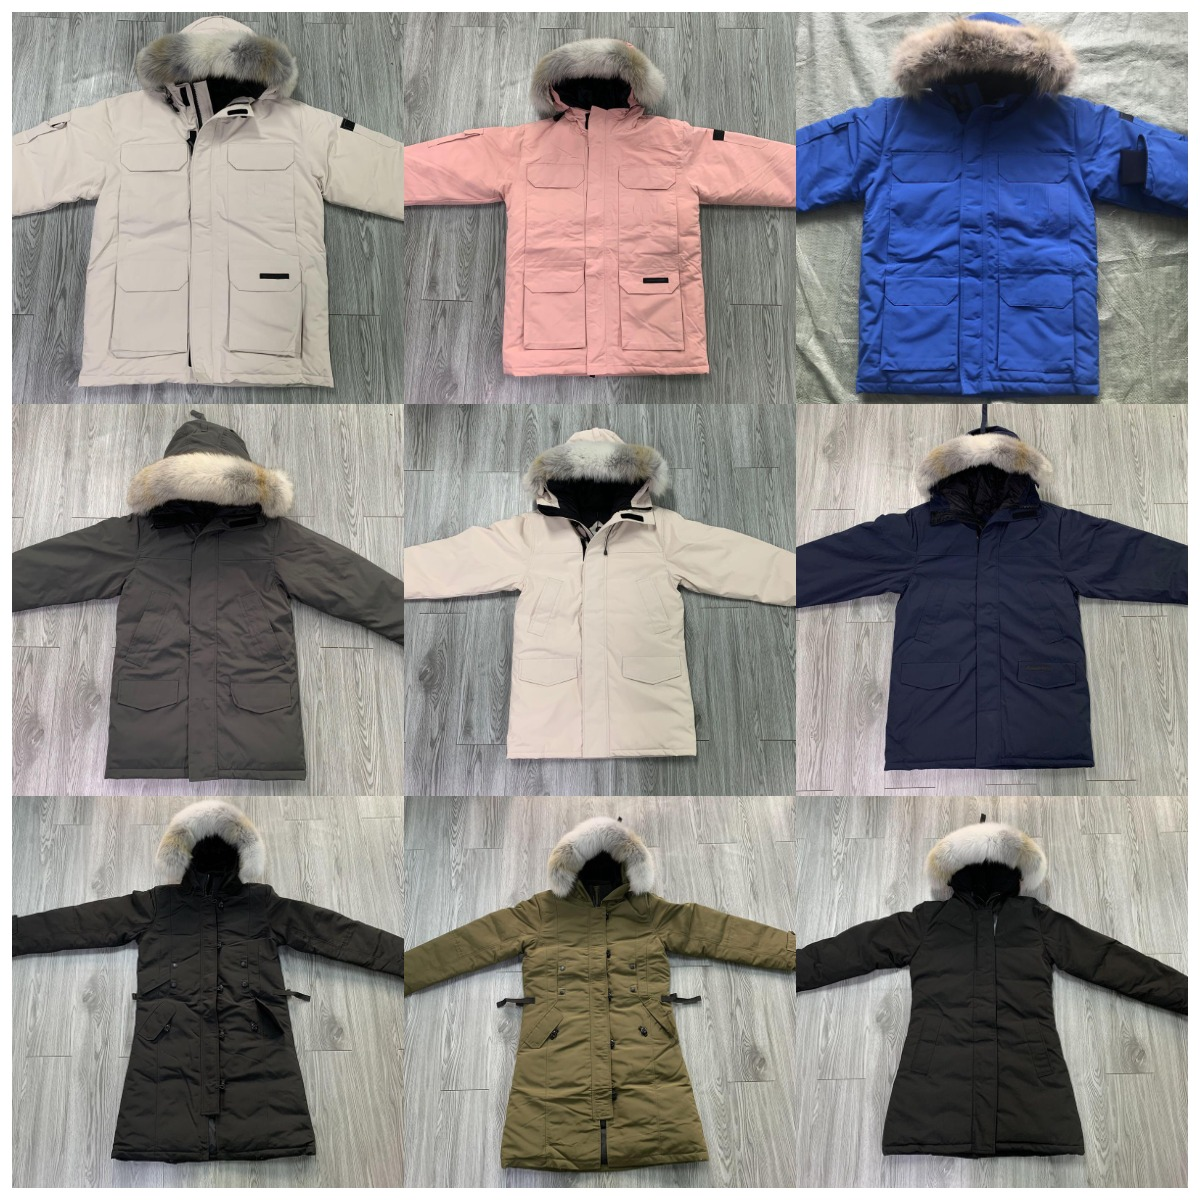 UK Winter Men Women Down Bomber Jacket Chaquetas Thicken White Wolf Fur Fourrure Fluffy hoodies Coat Outdoor Classic Windproof Warm Parkas E0712Z Size XS-2XL